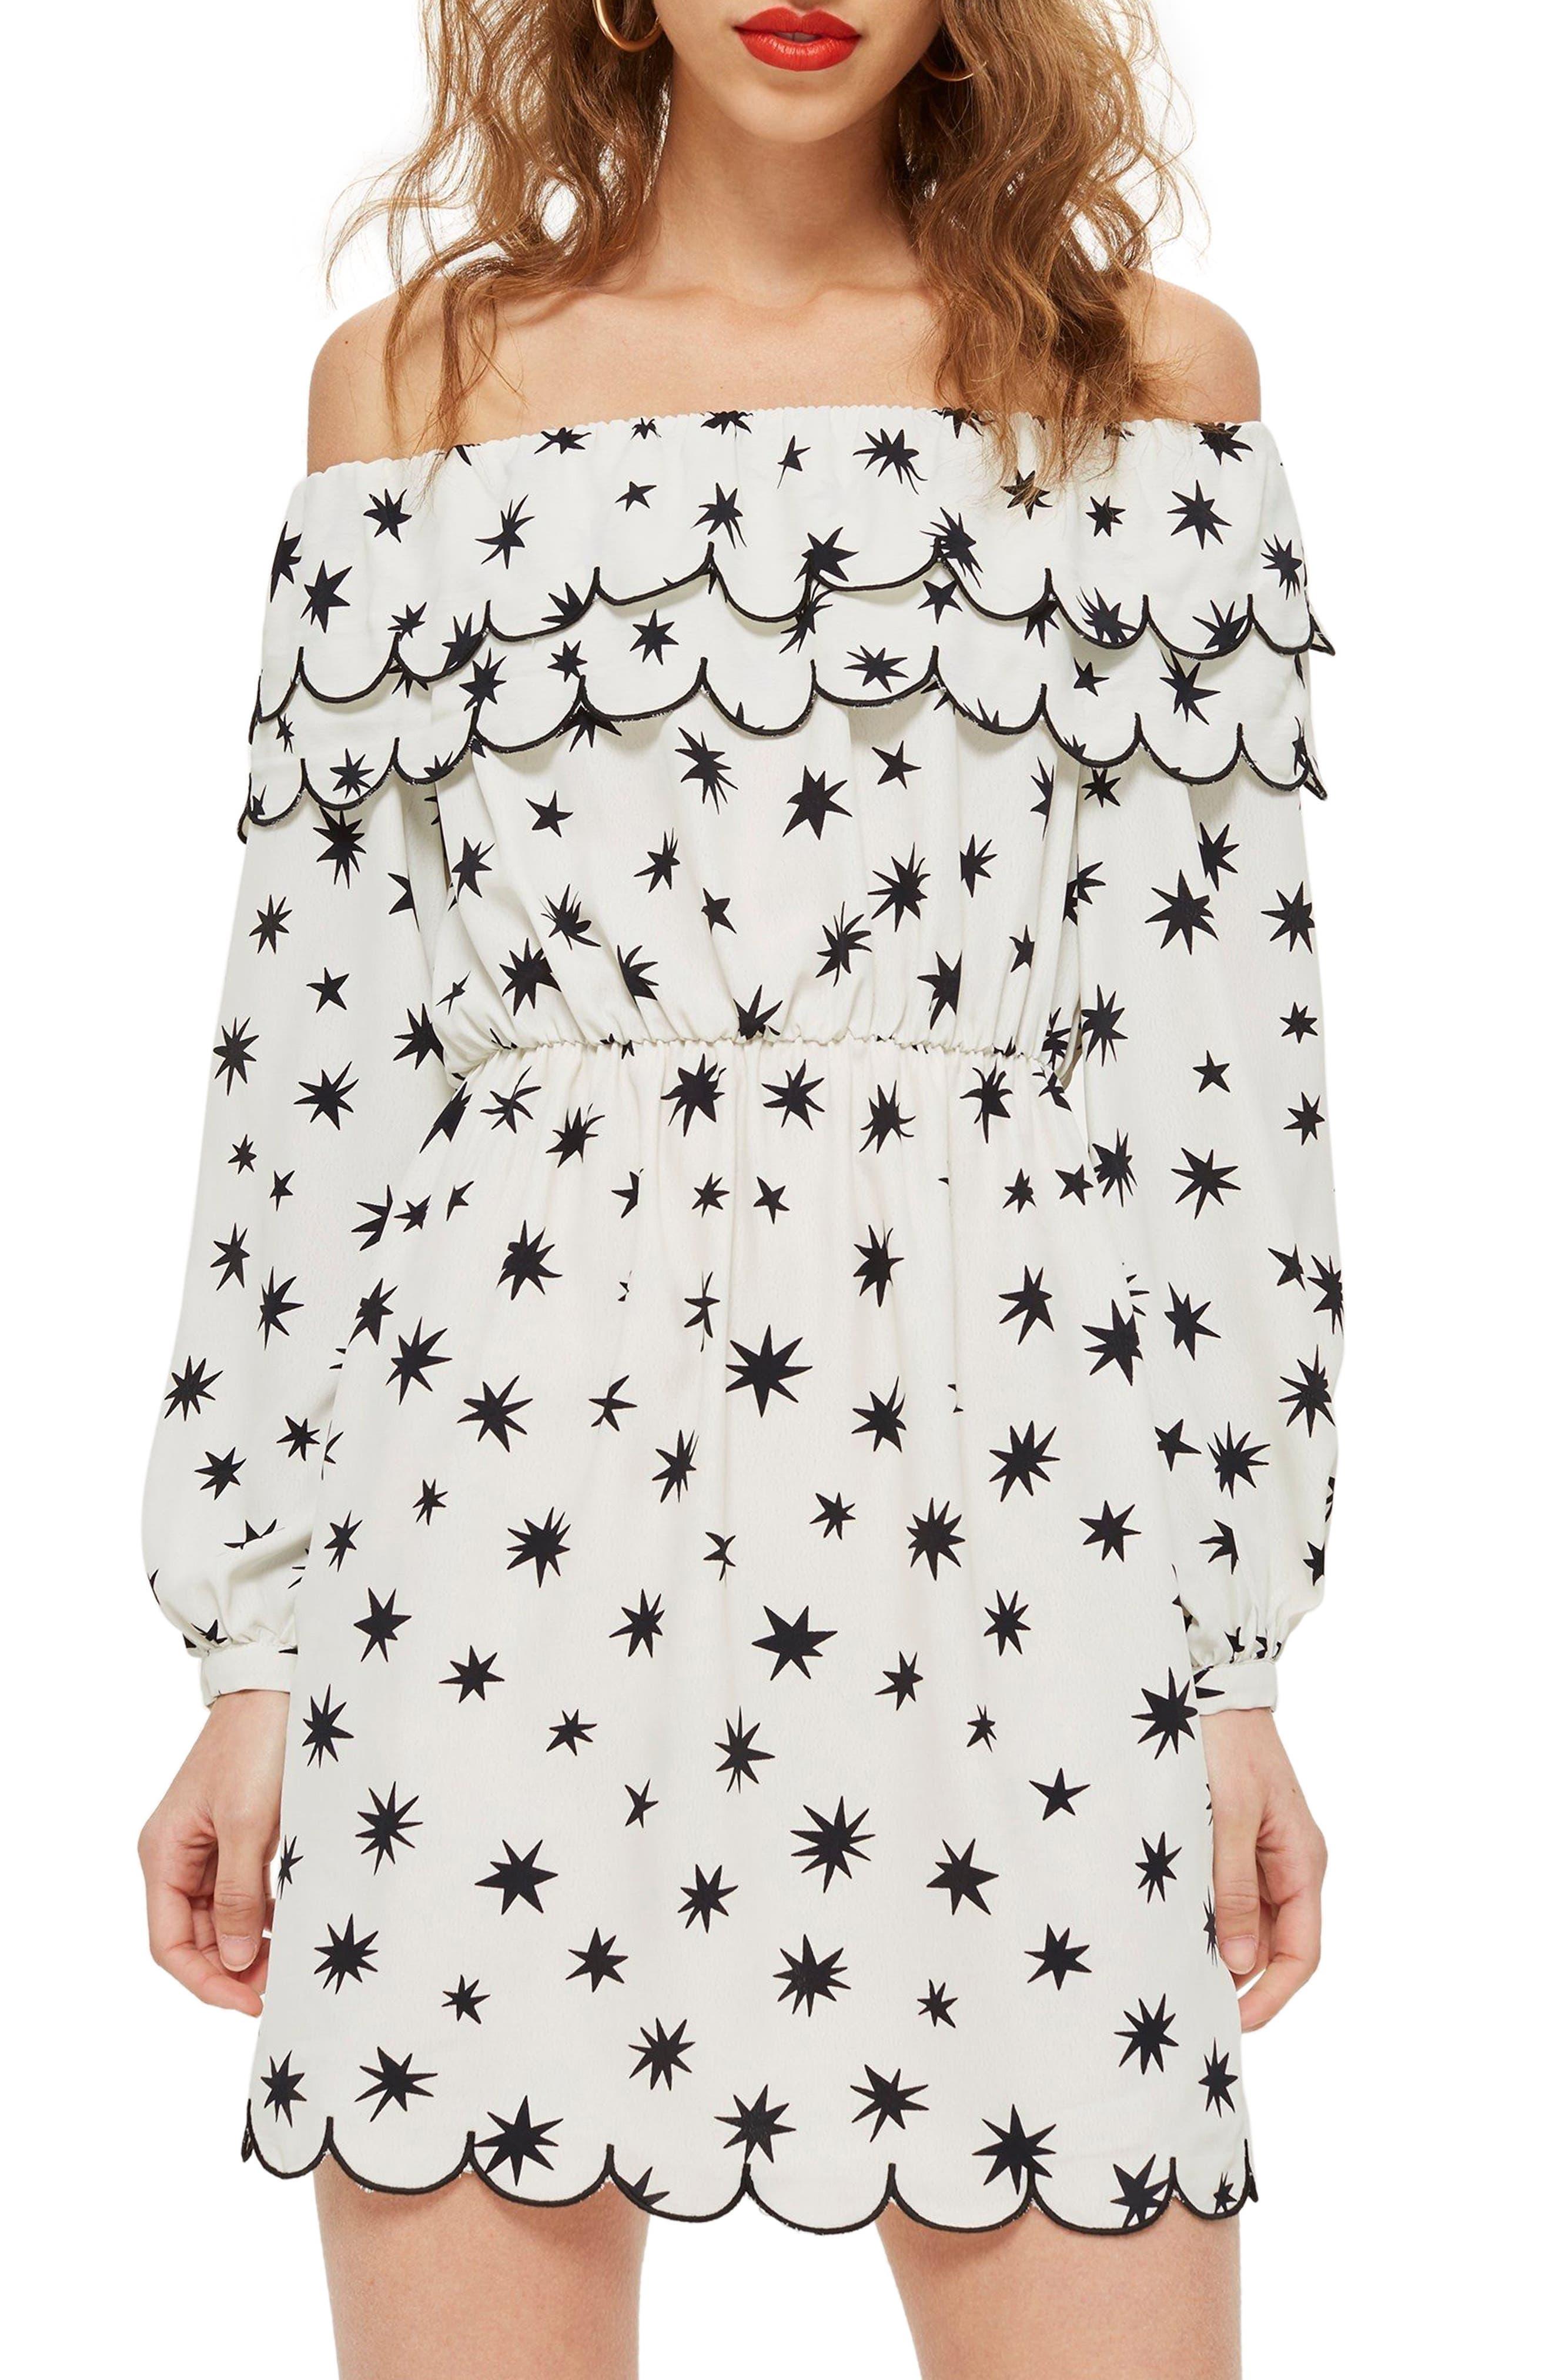 Topshop Scallop Star Off the Shoulder Dress